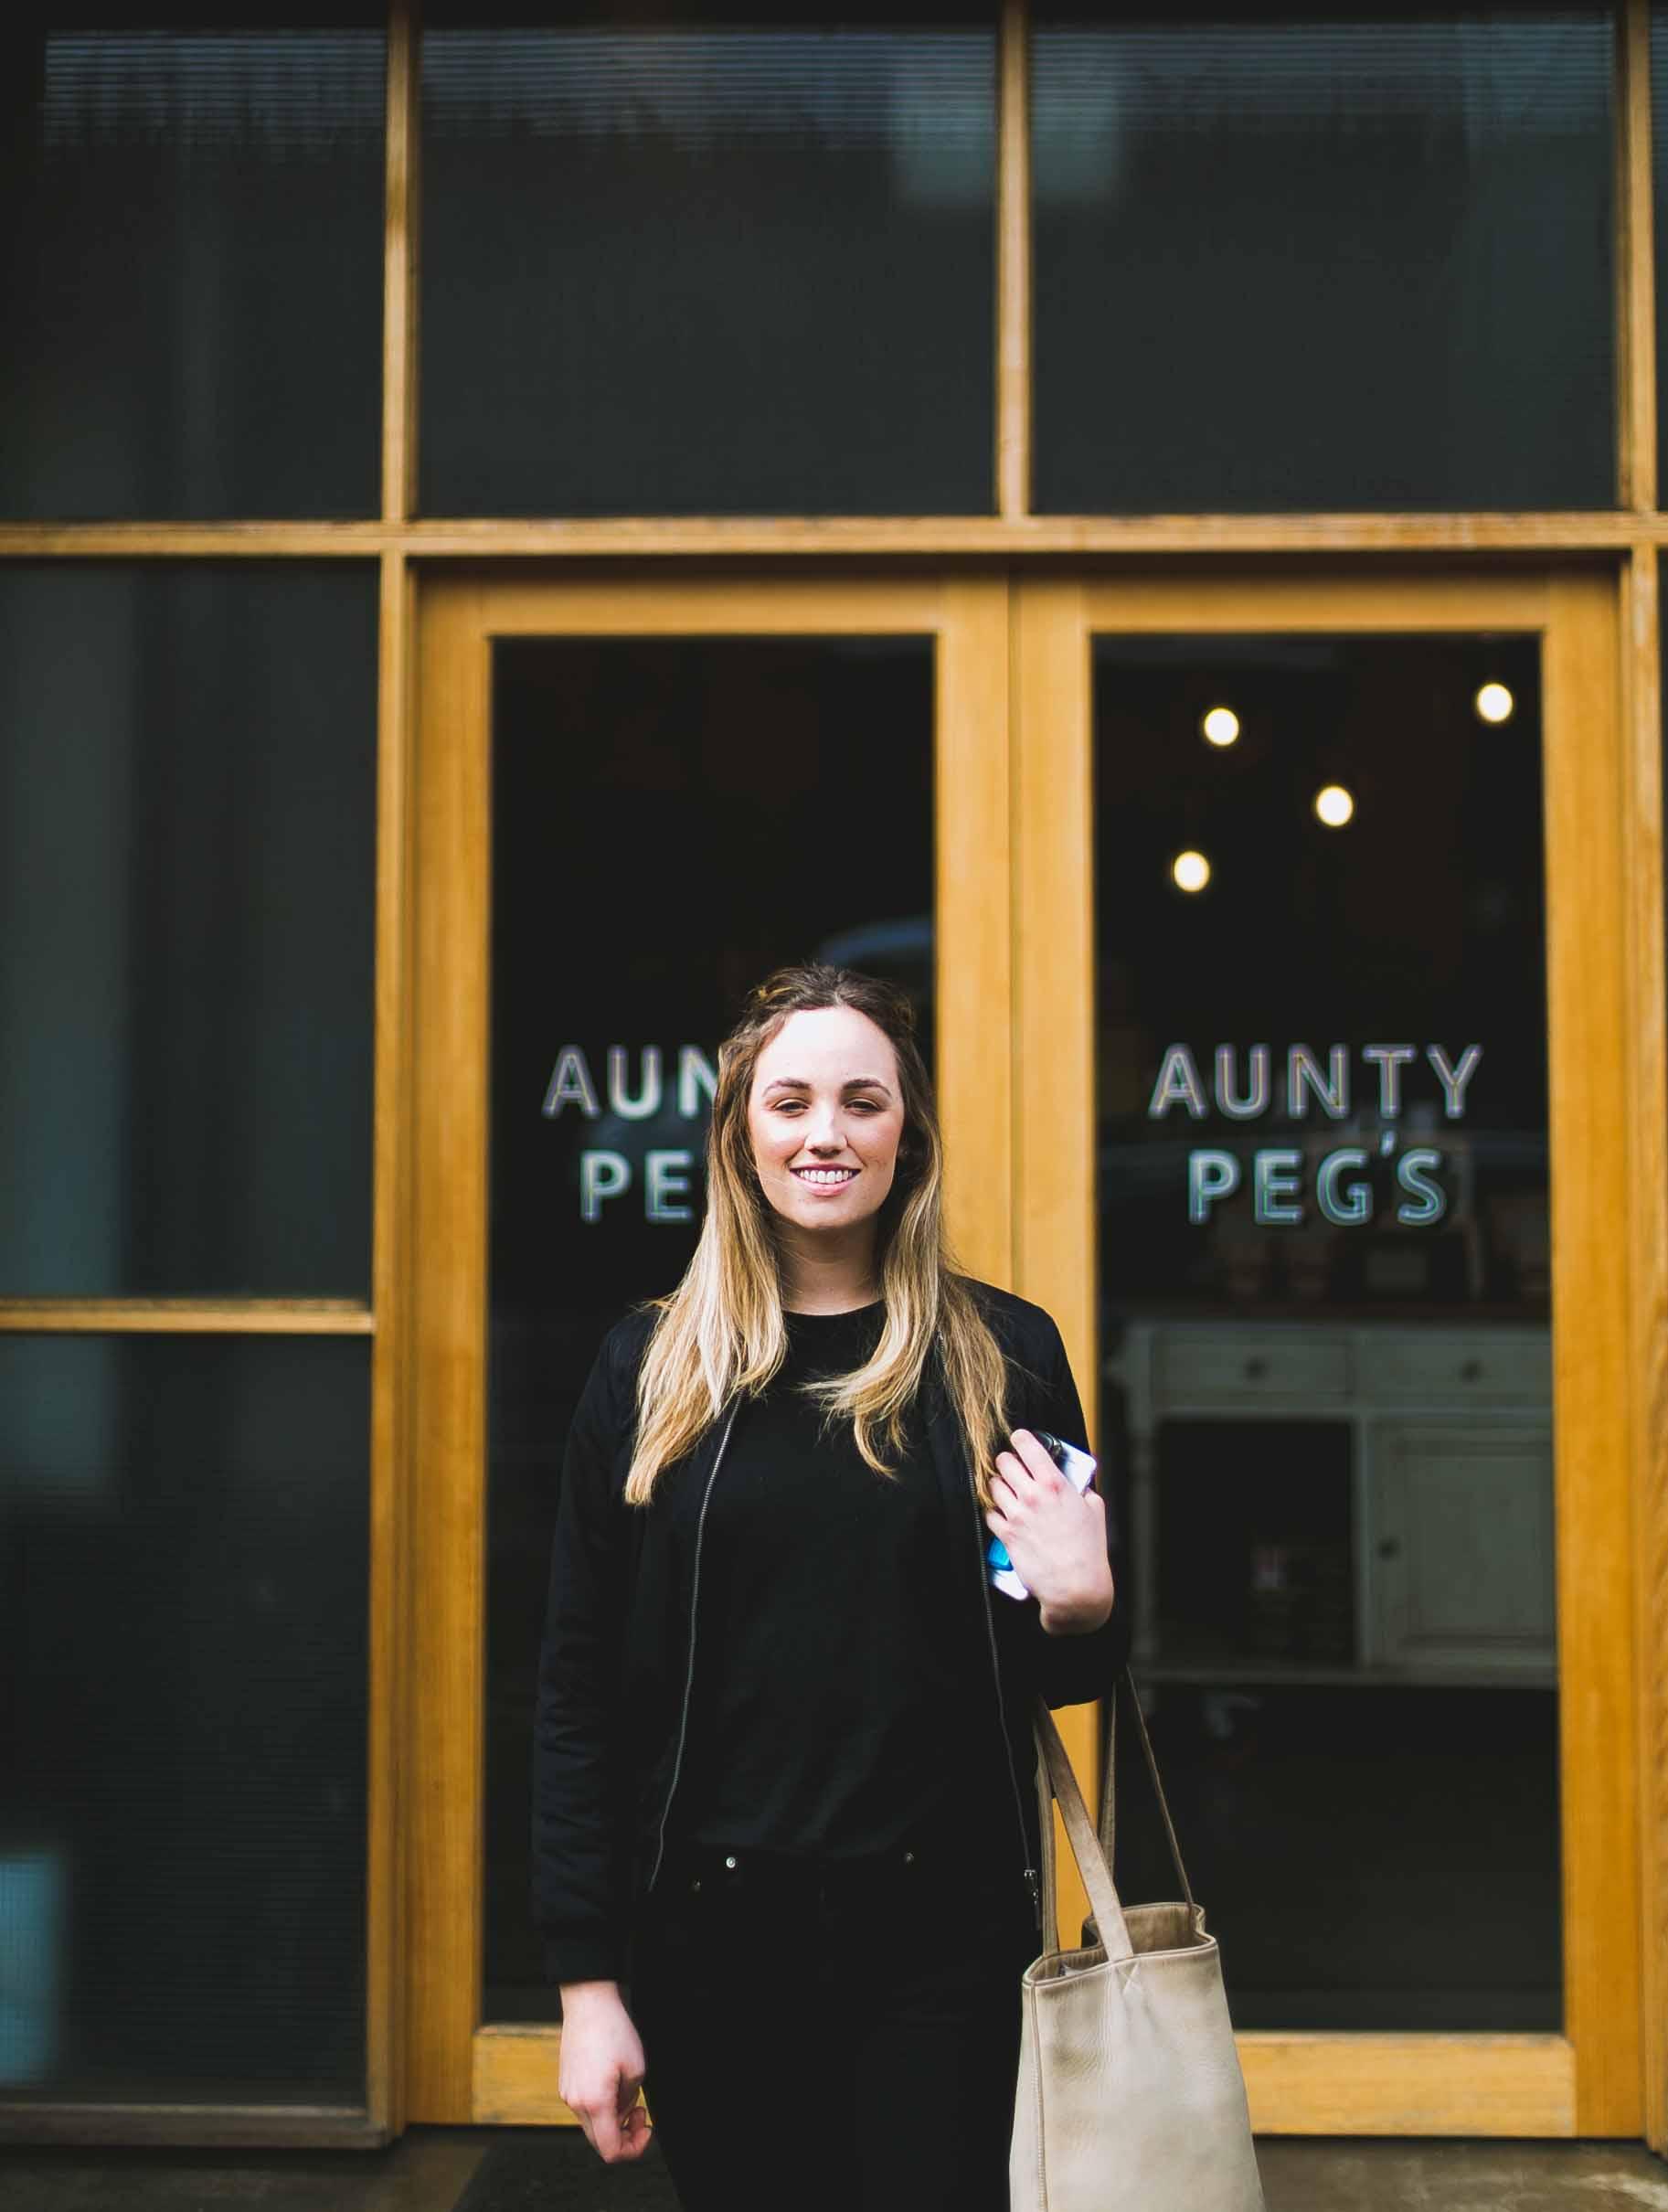 Aunty Pegs, Proud Mary